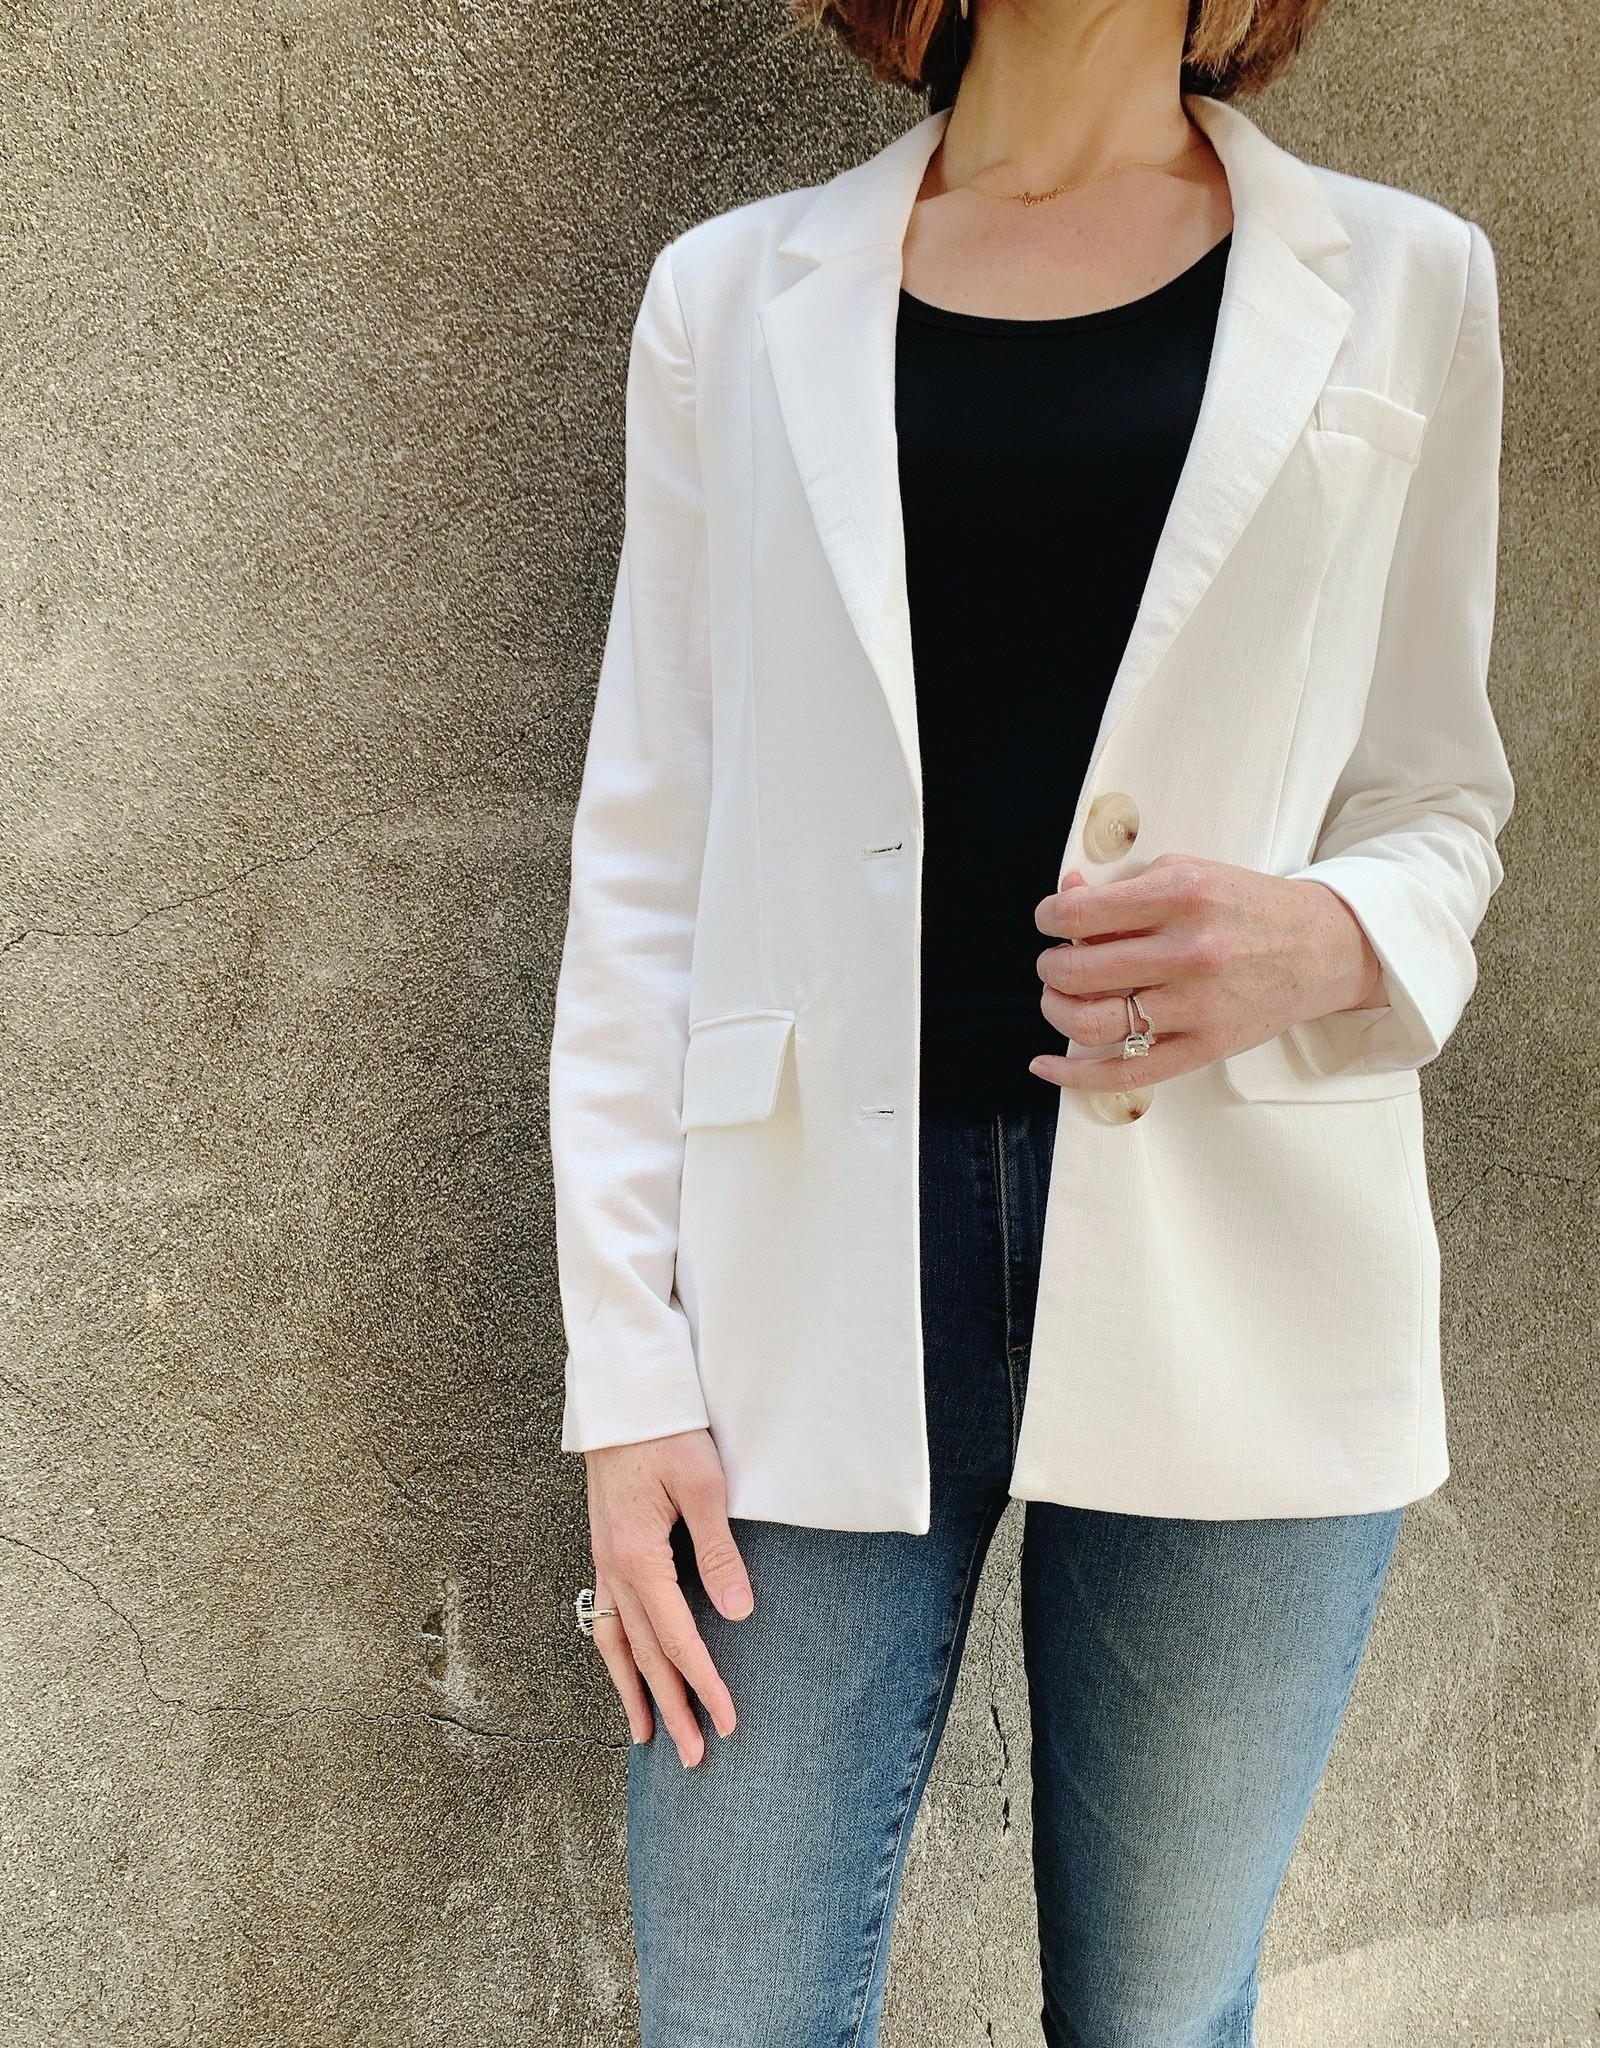 FRNCH Women's Woven Jacket White